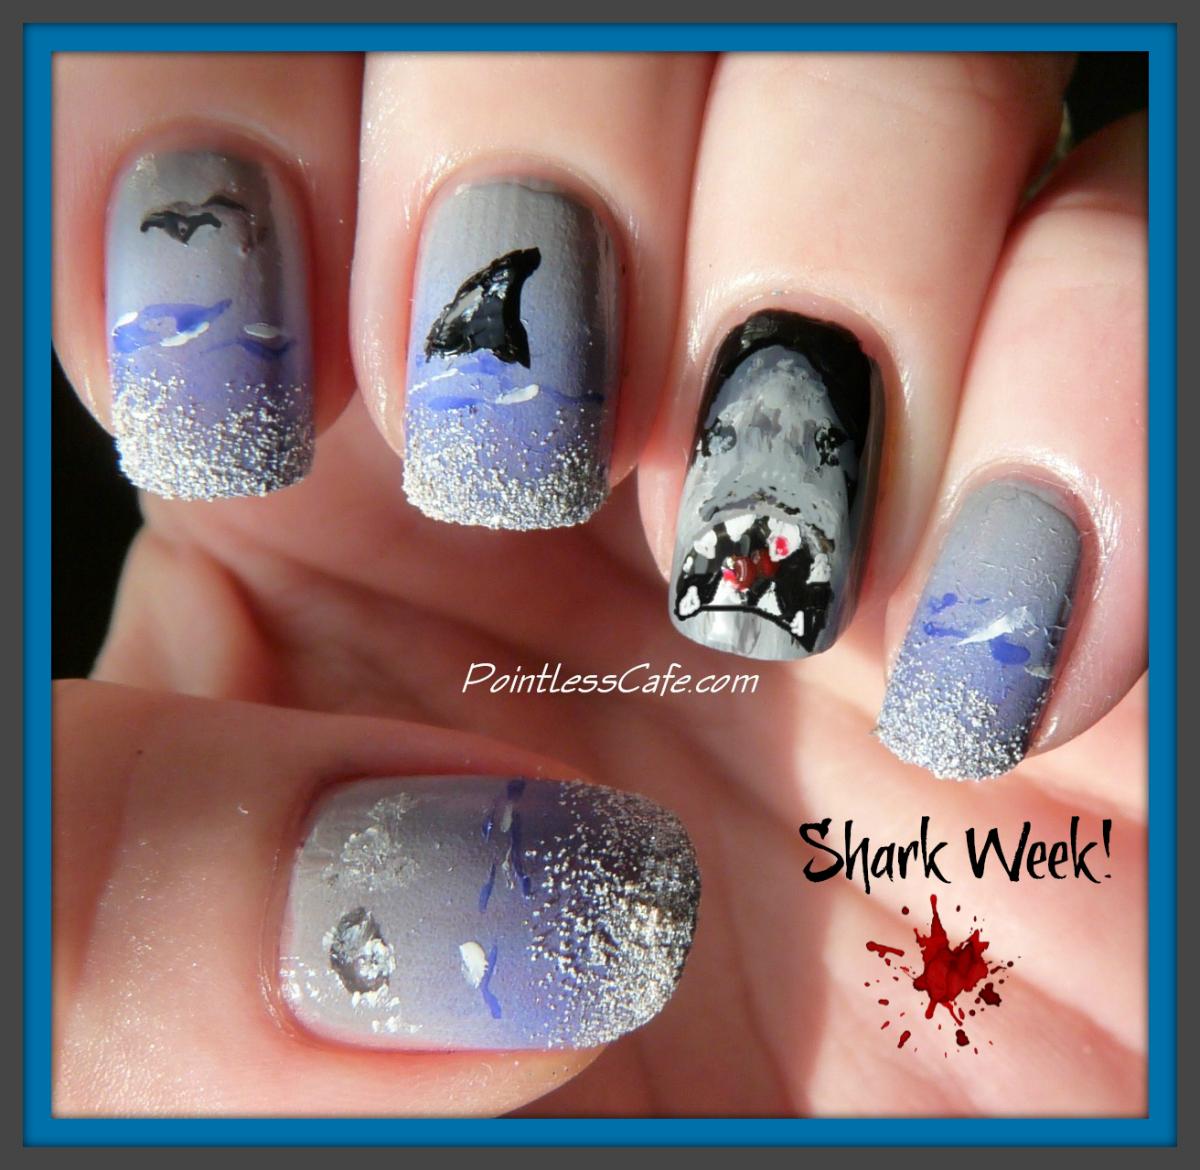 Shark Week Nail Art Pointless Cafe